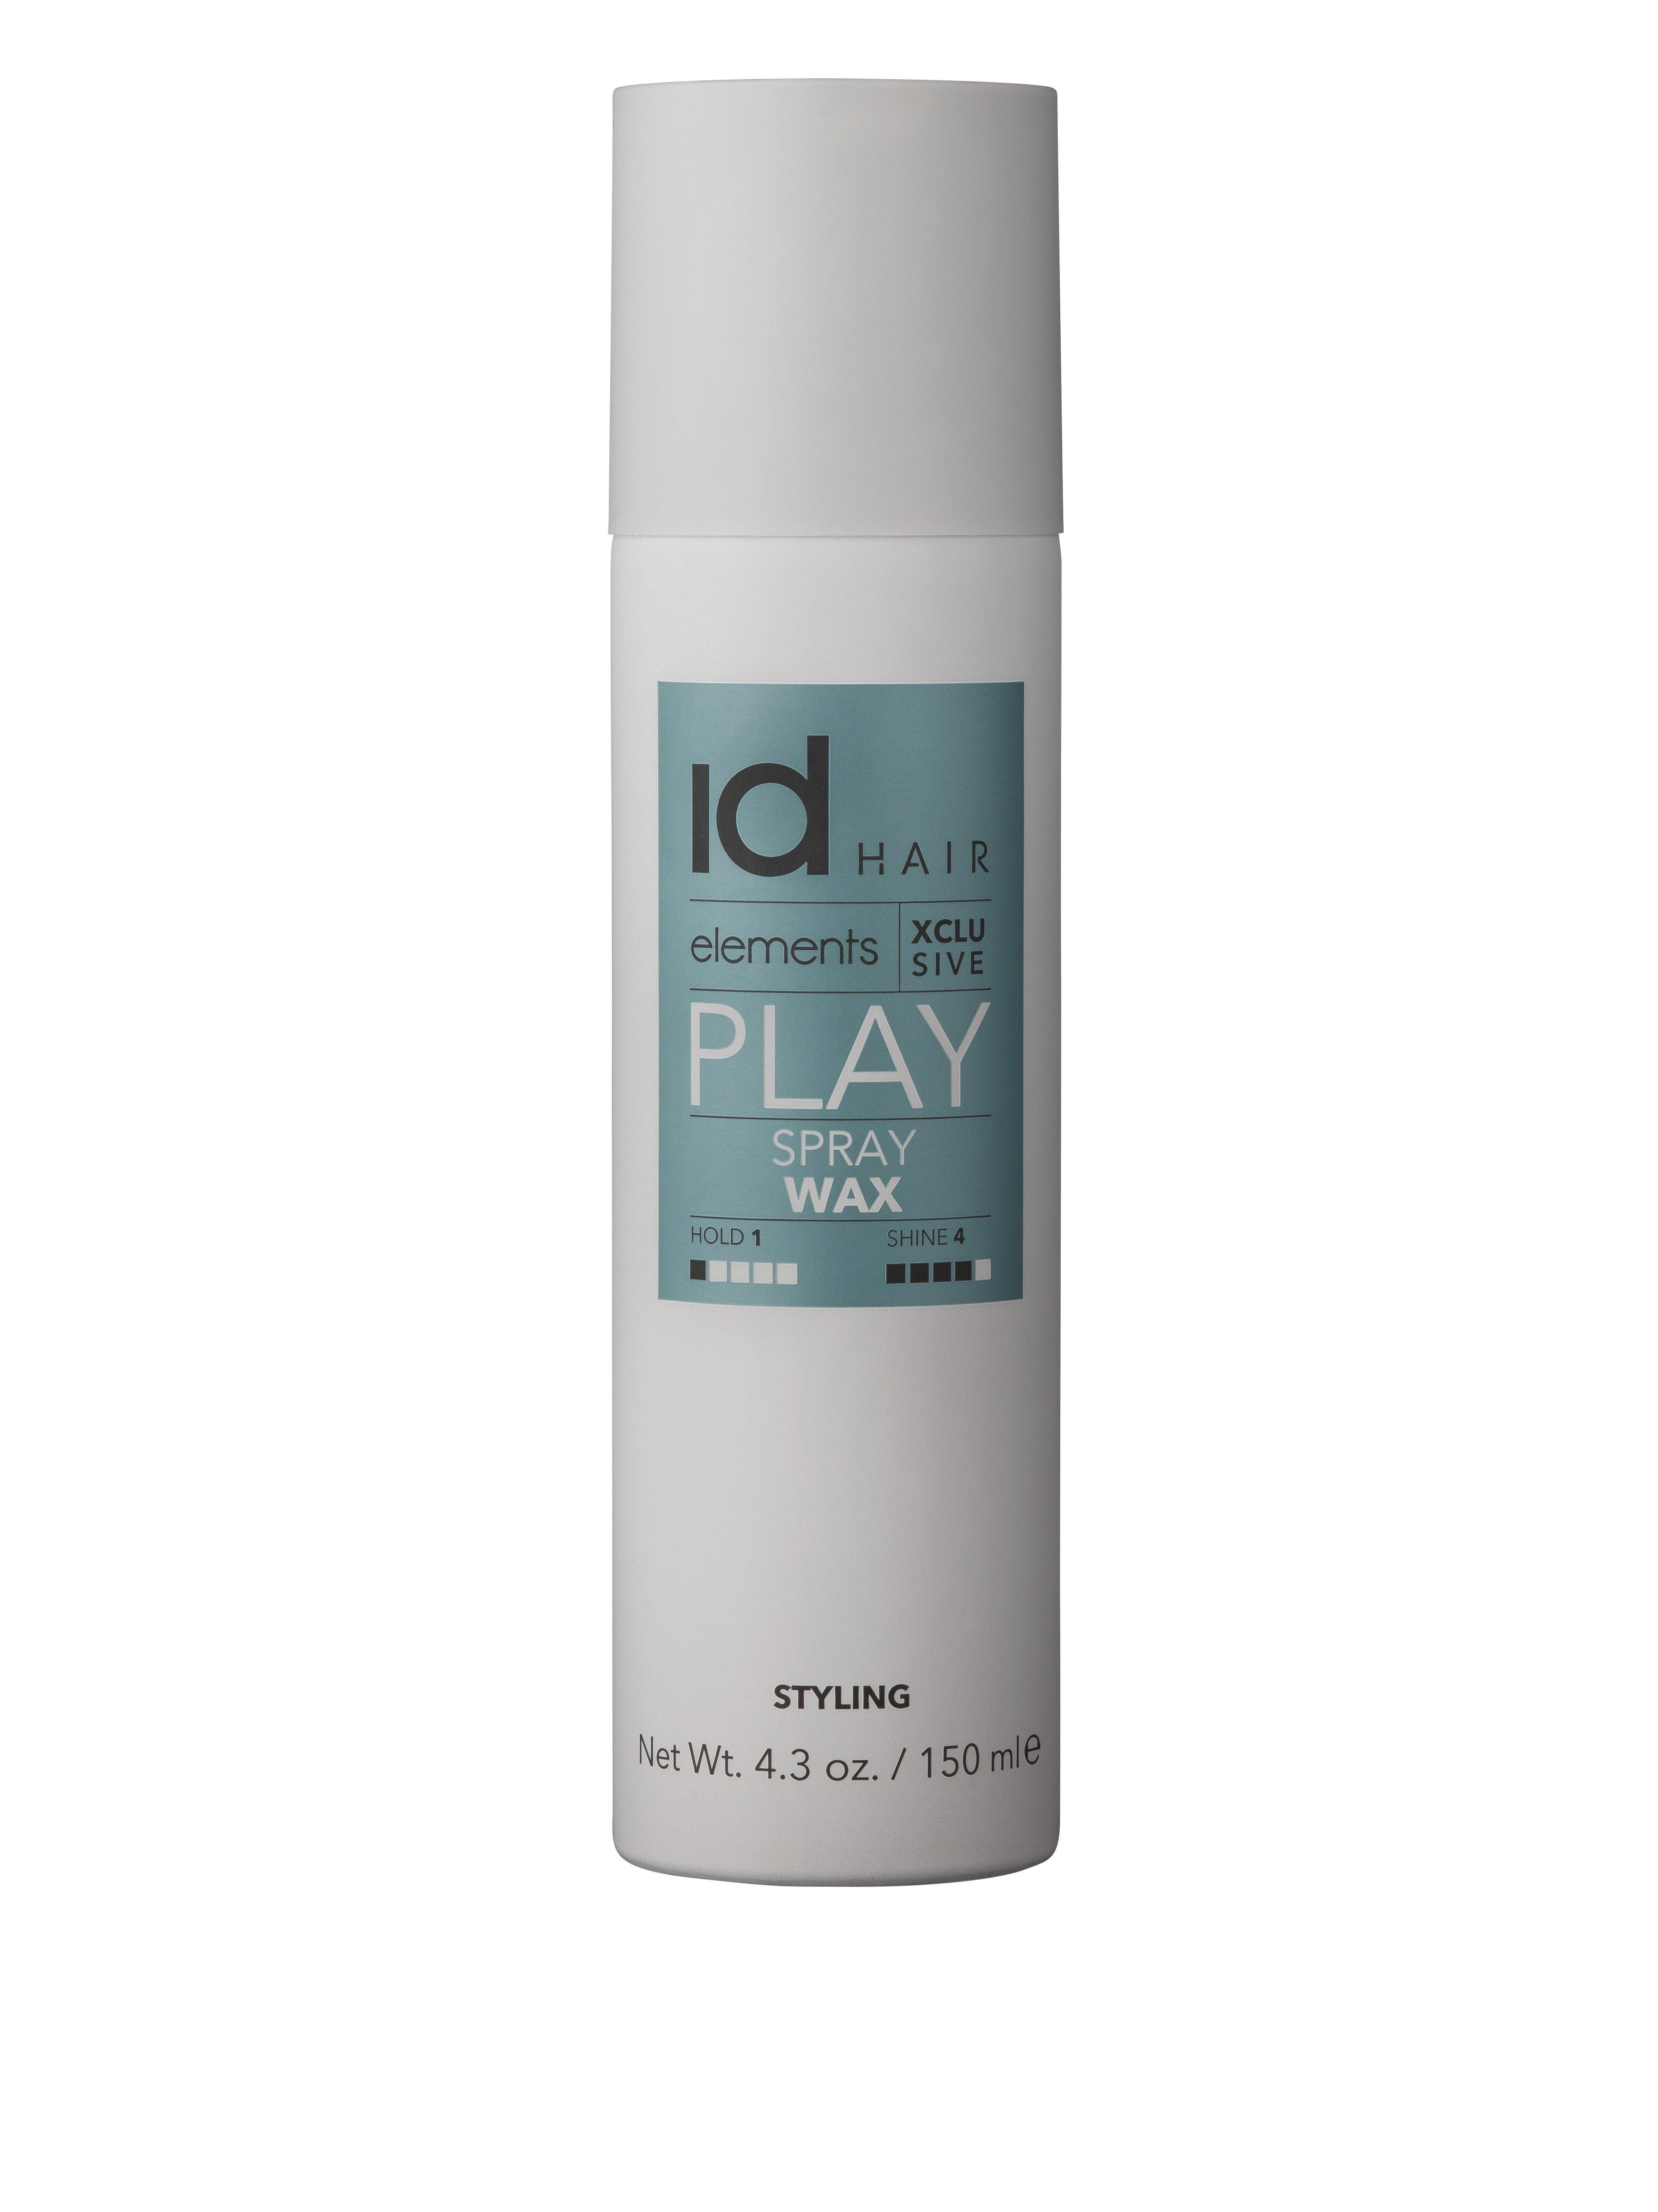 IdHAIR - Elements Xclusive Spray Wax 150 ml